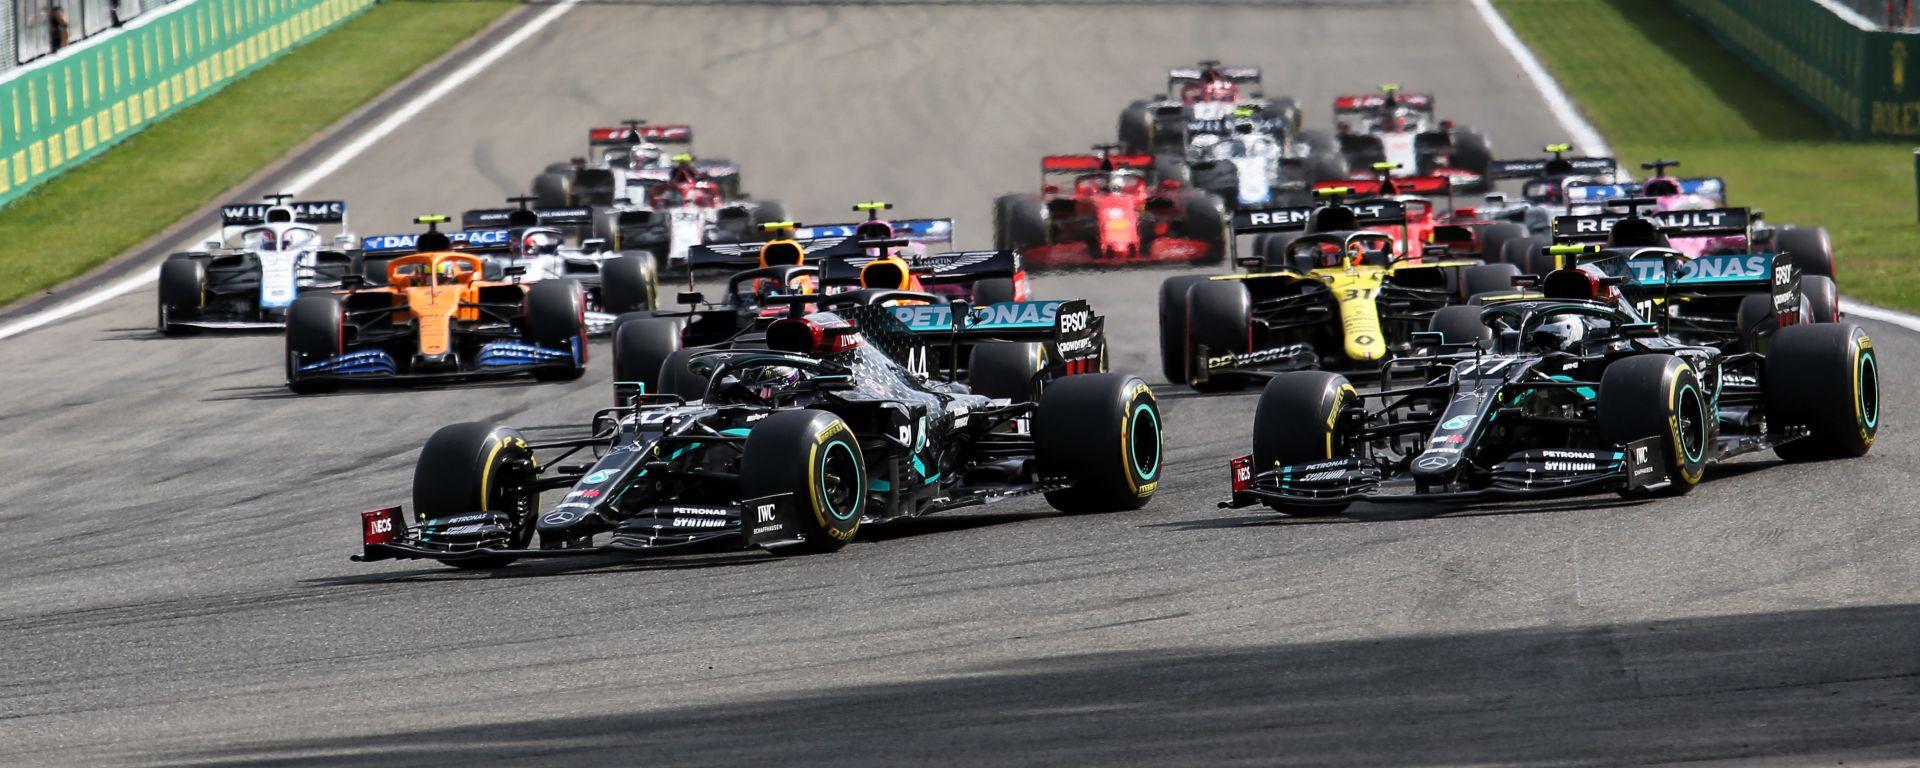 F1, GP Belgio 2020: la partenza